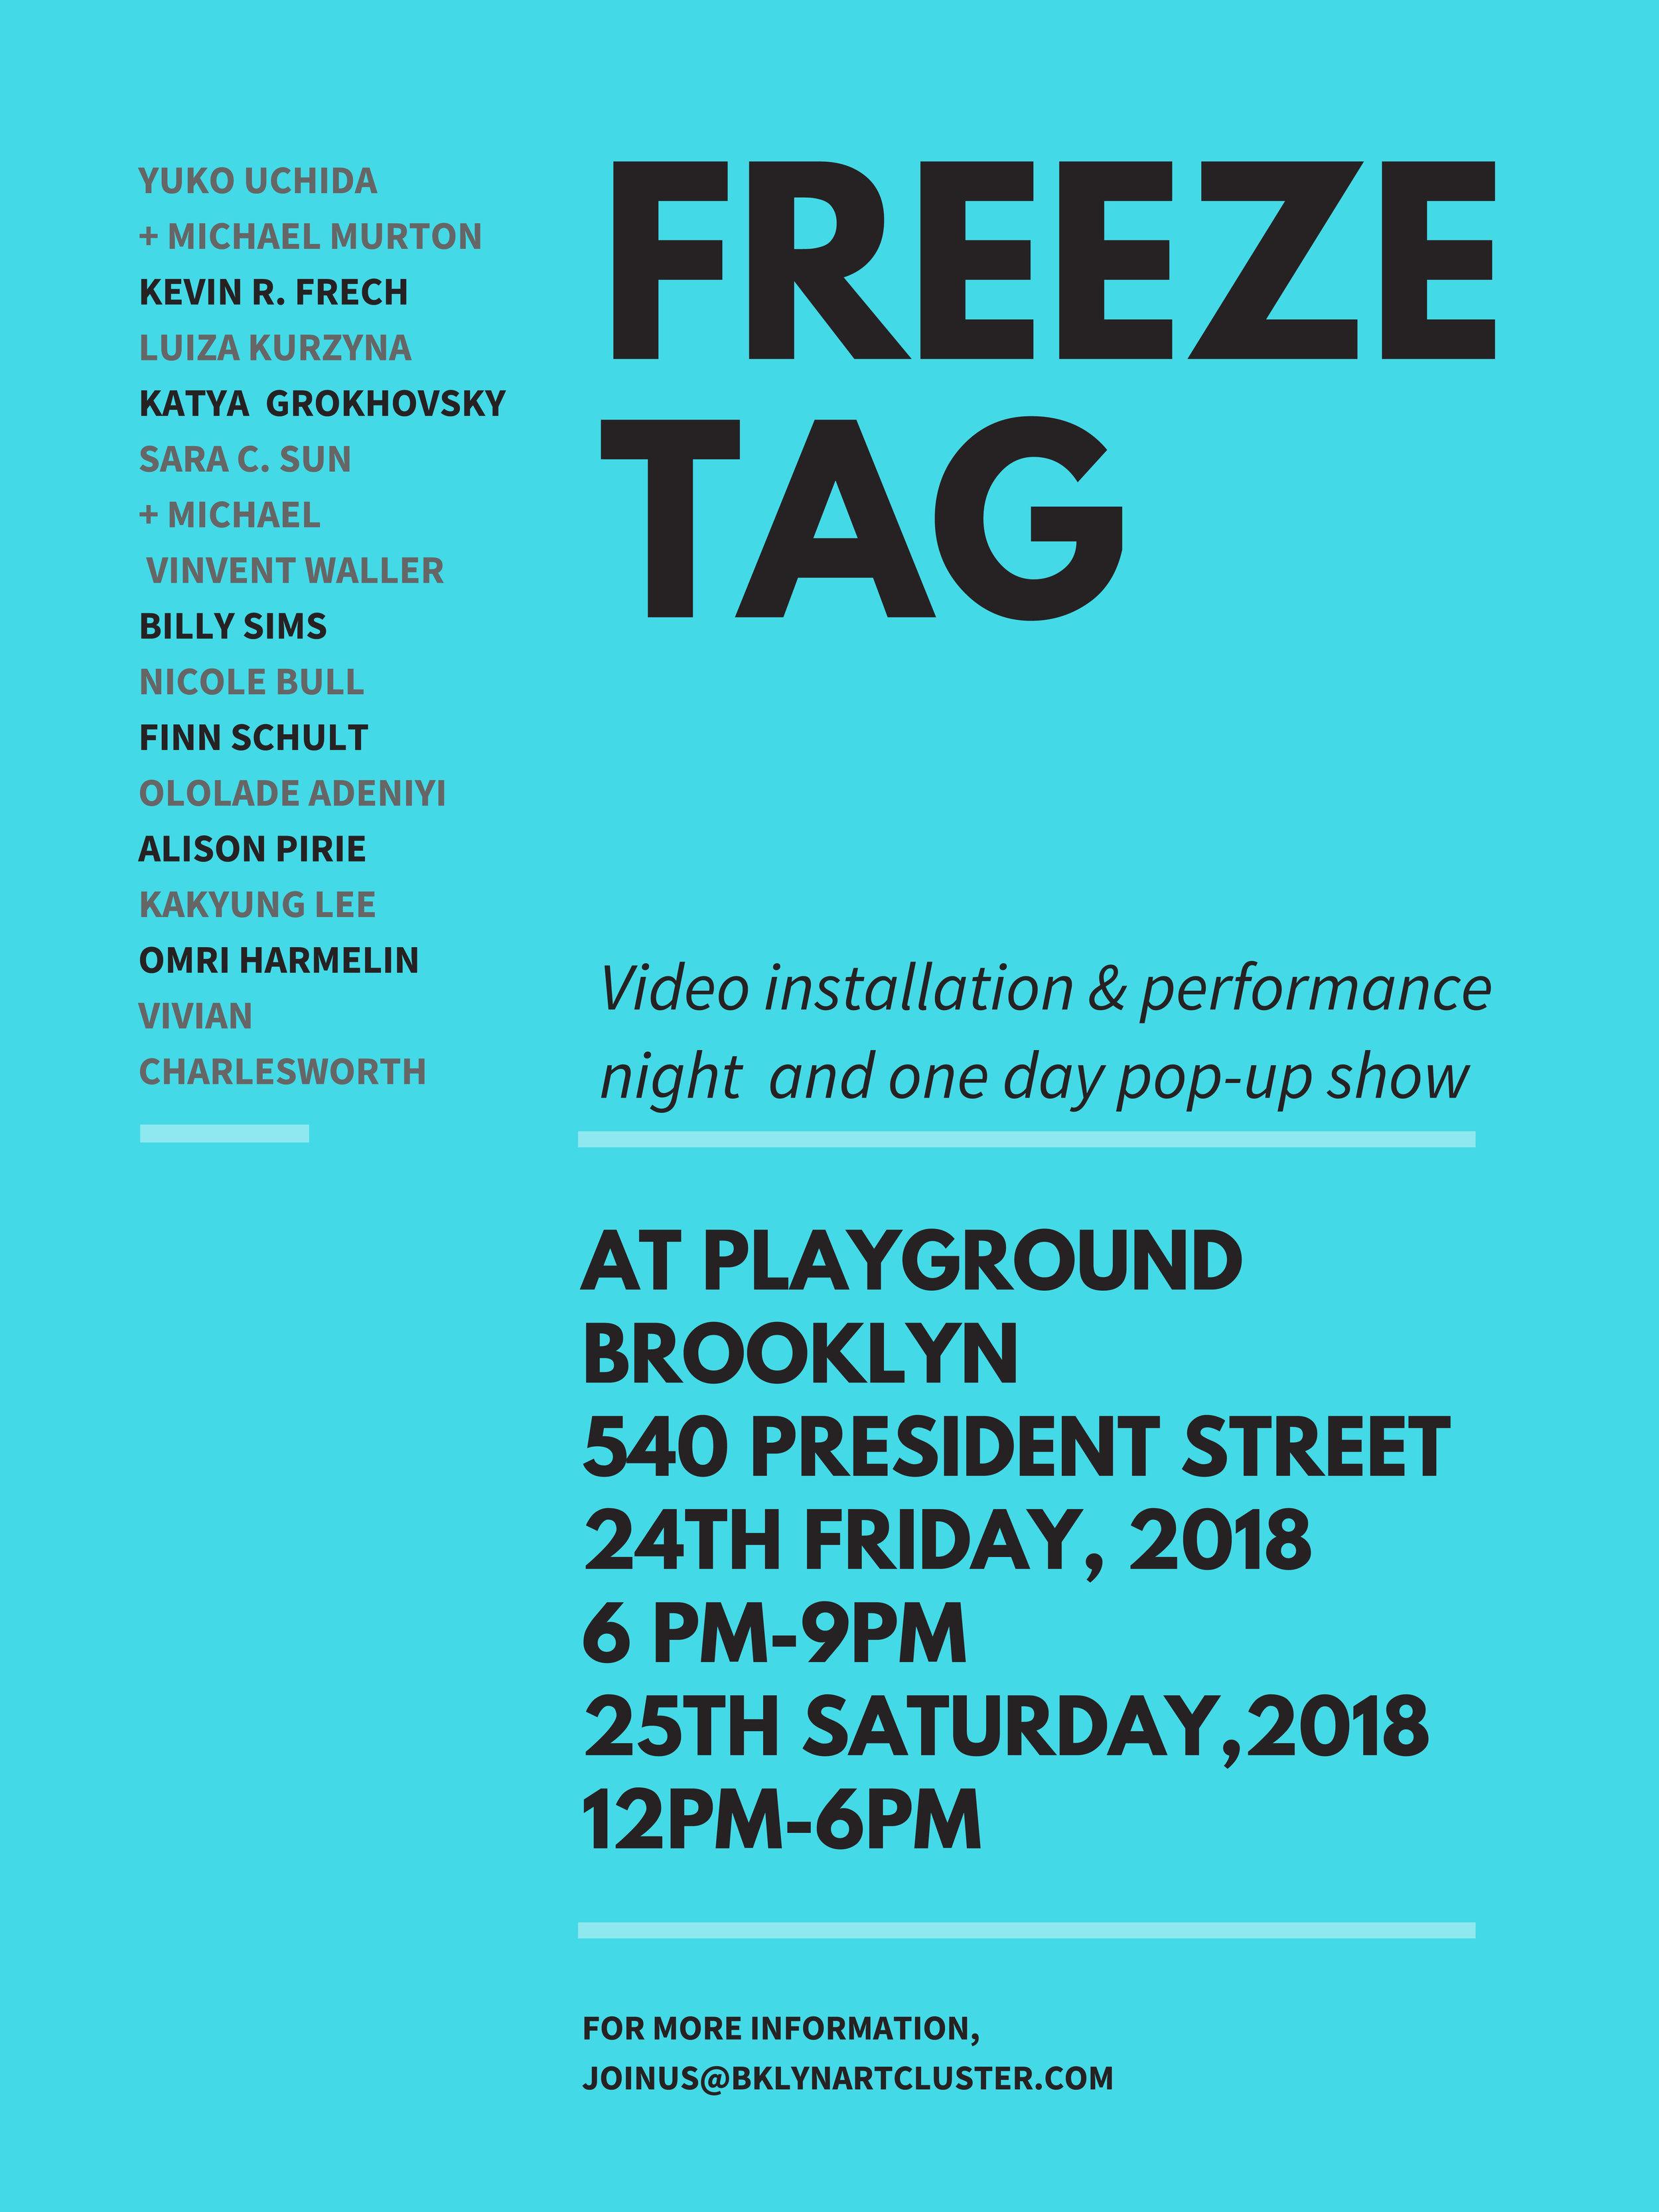 Freeze tag poster.jpg